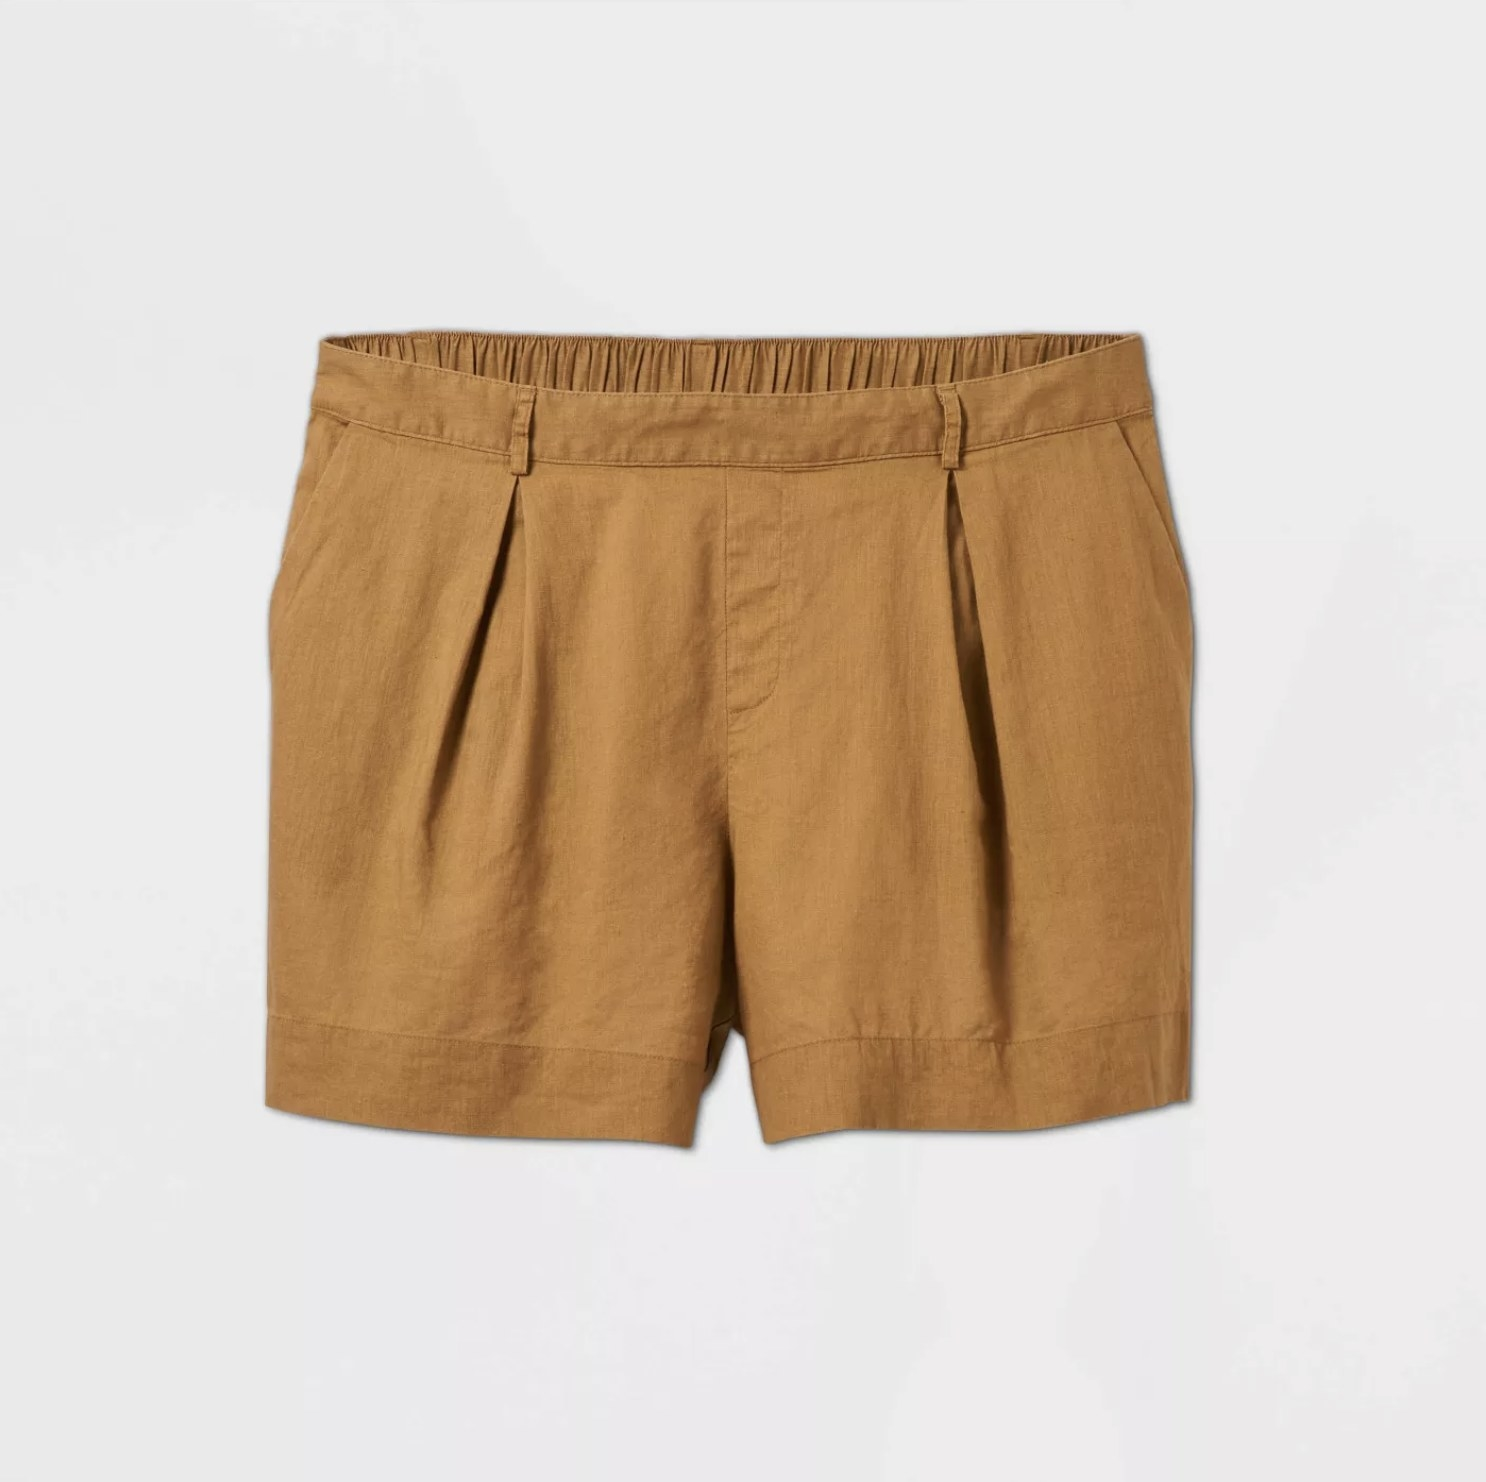 A pair of dark tan linen shorts with an elastic waist band